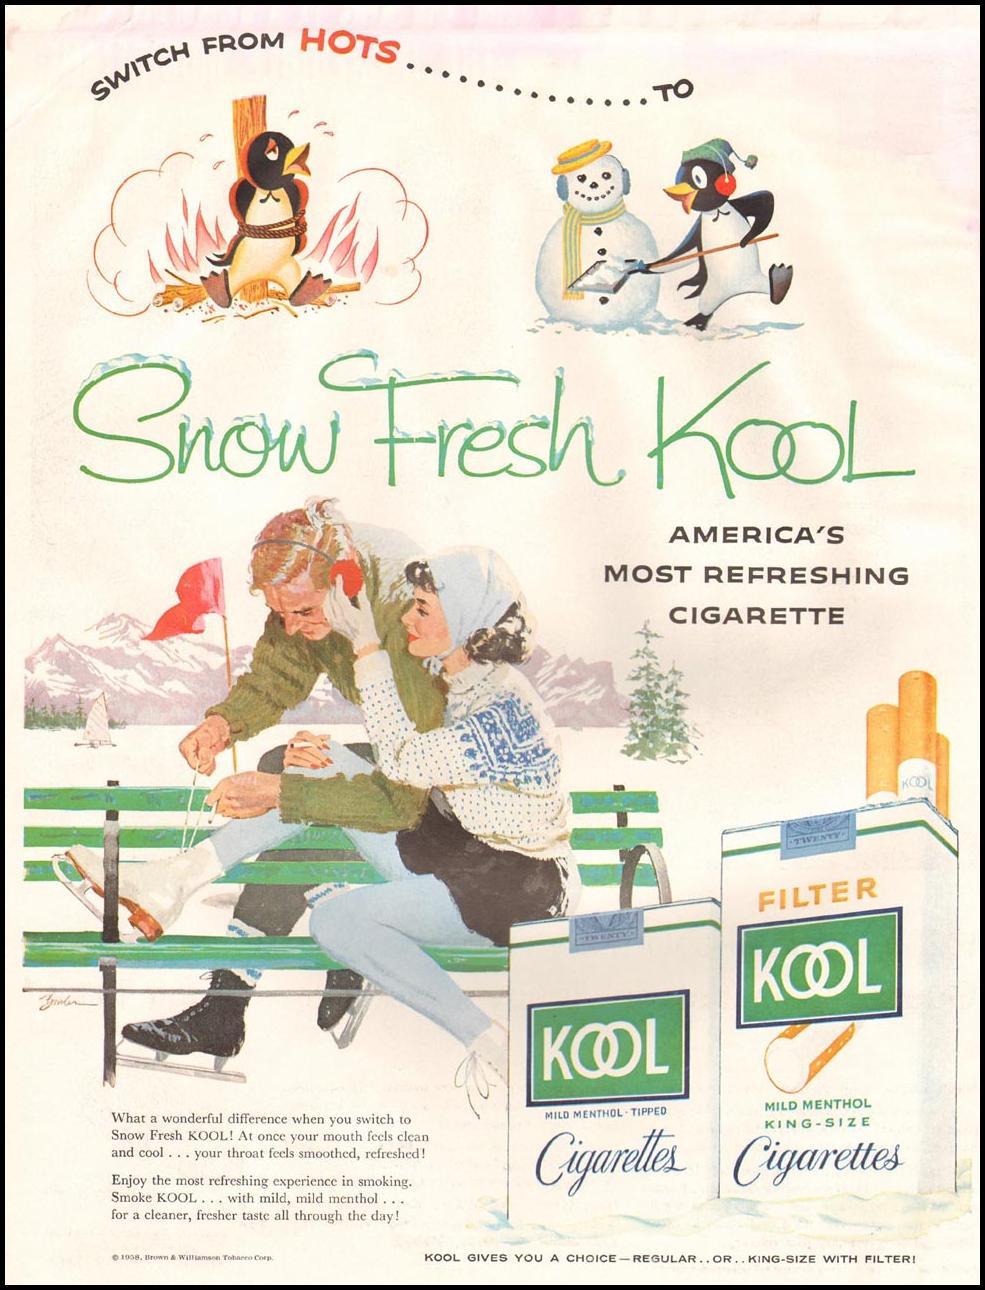 KOOL CIGARETTES LIFE 11/24/1957 INSIDE FRONT